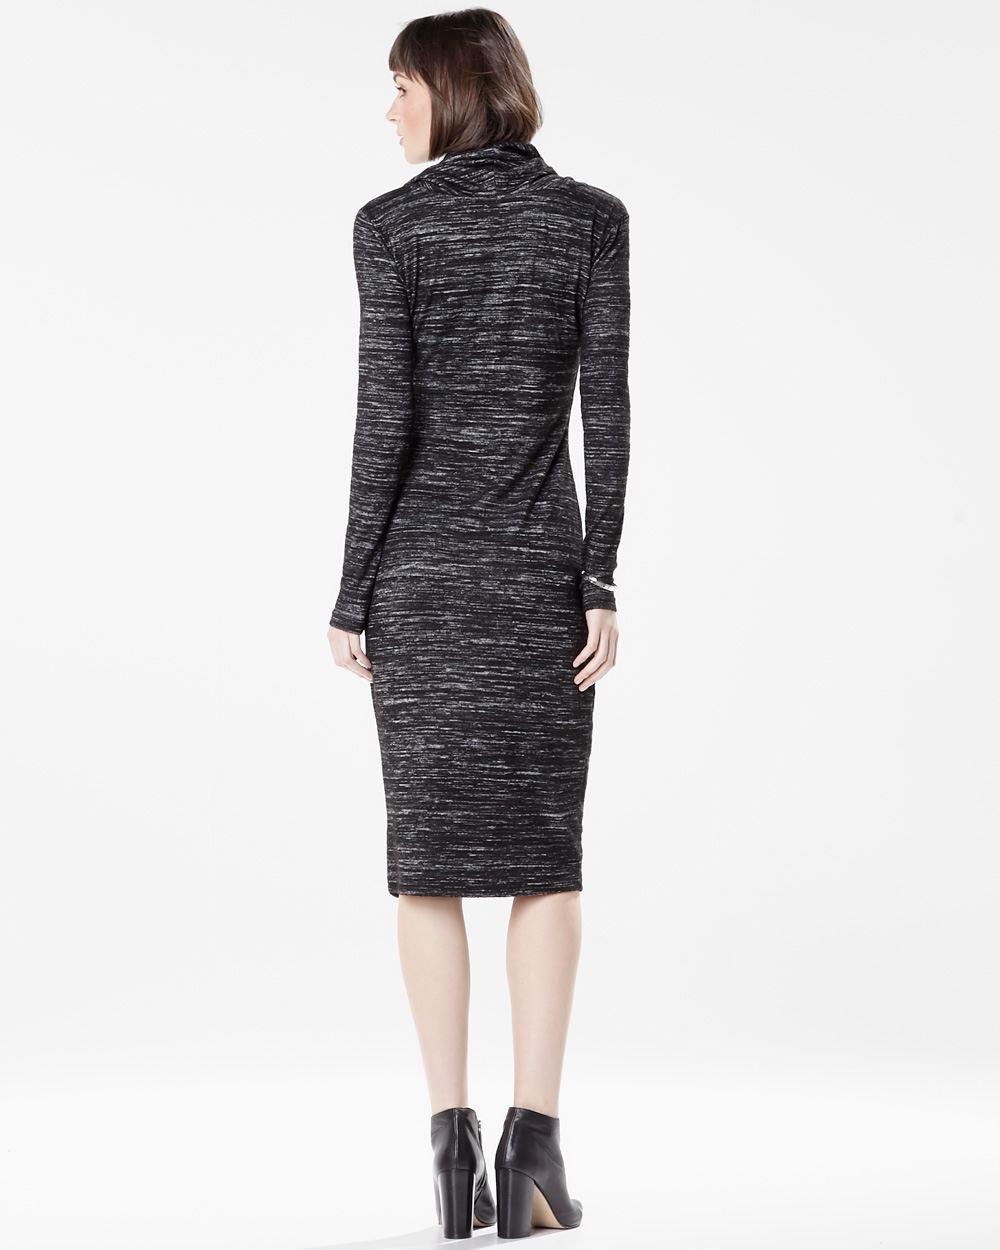 Cowl Neck Hooded Dress: Long Sleeve Cowl-neck Knit Dress